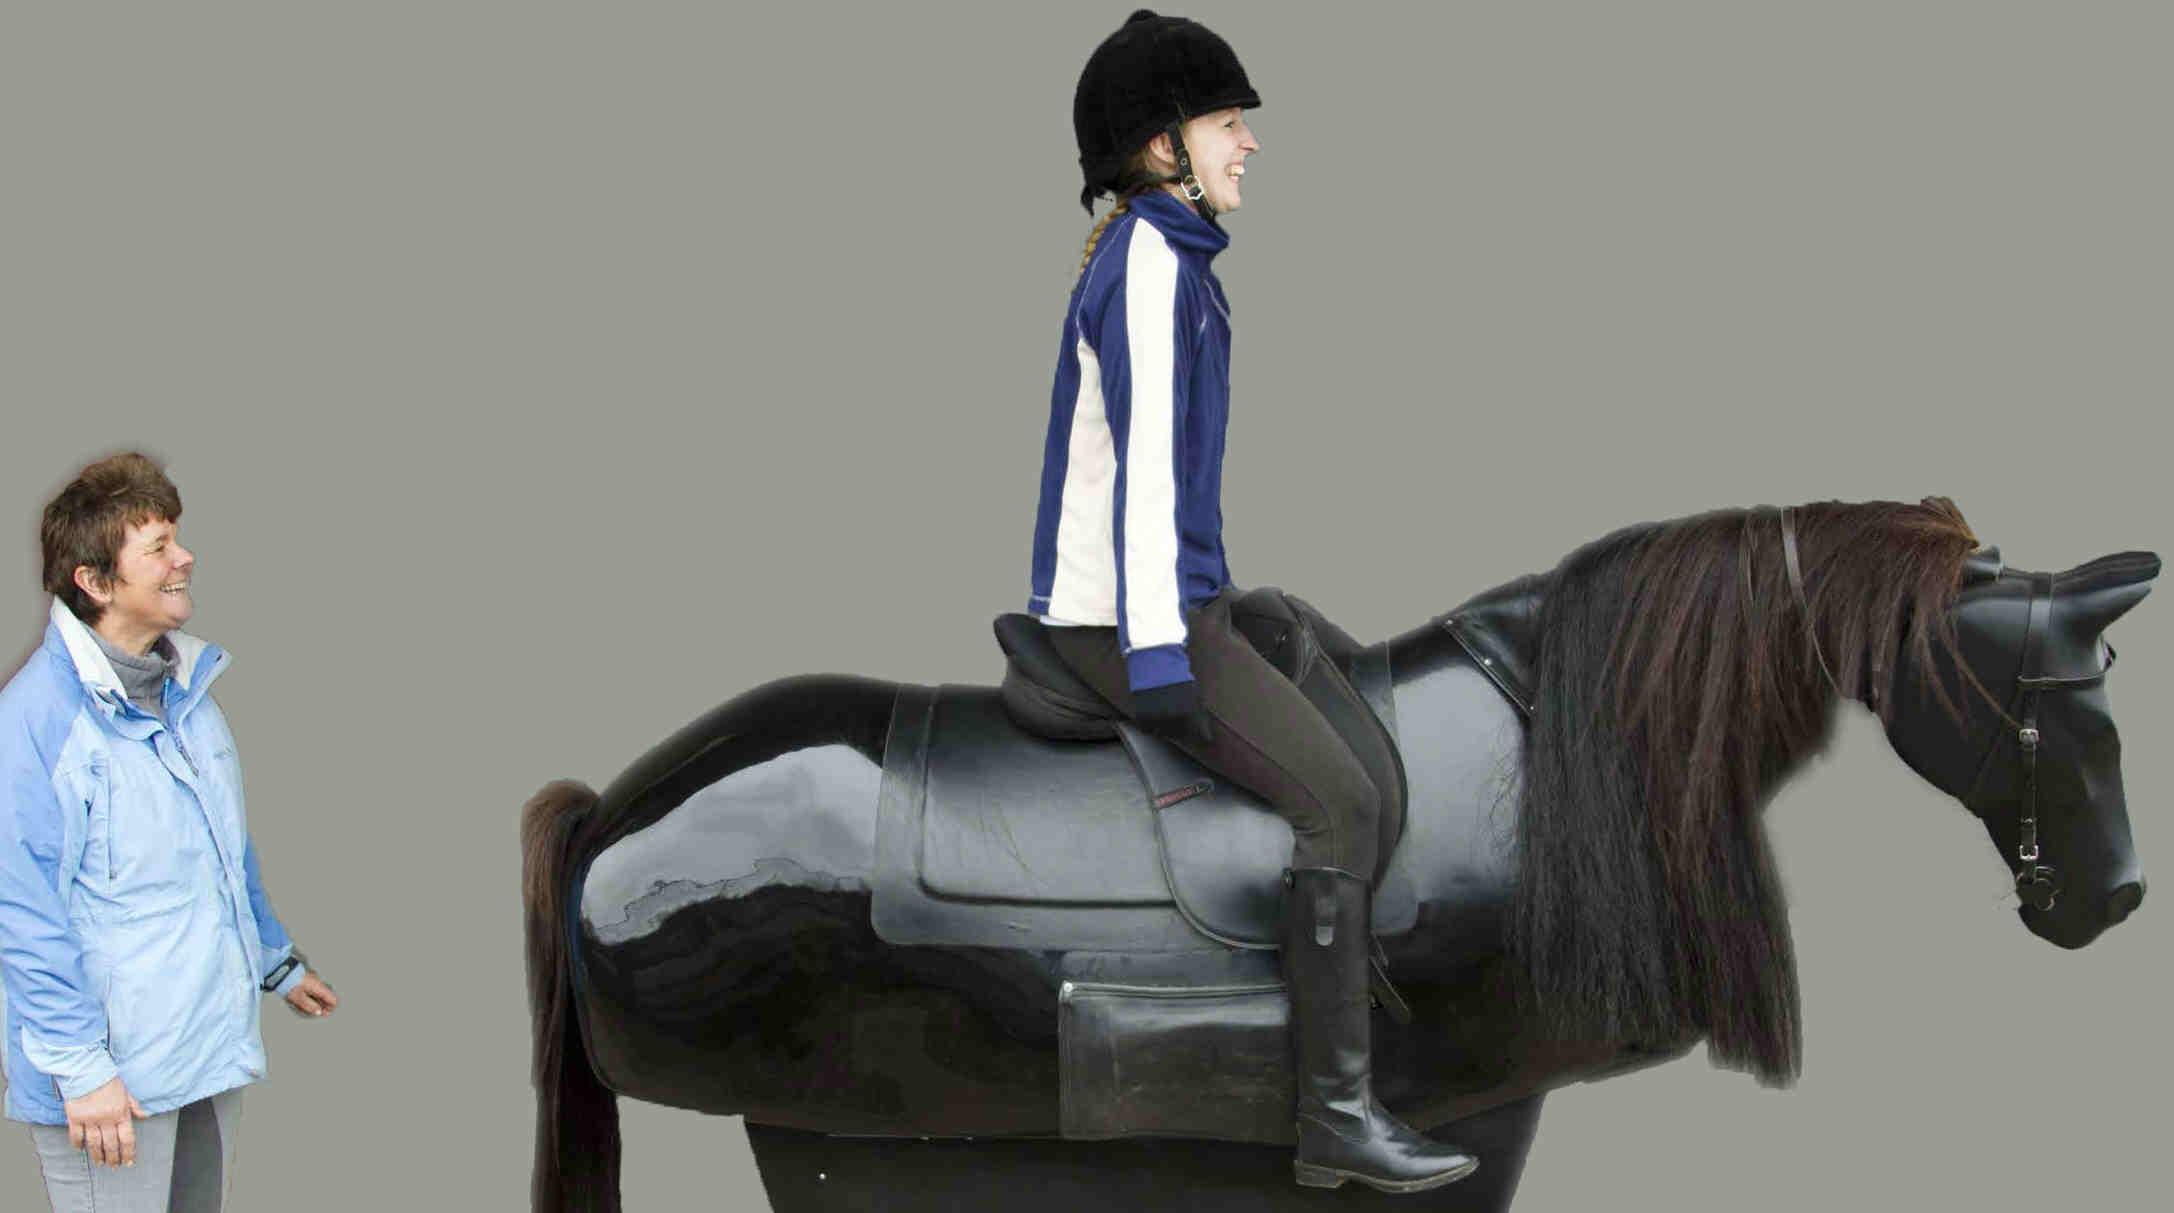 Racehorse Simulator For Sale